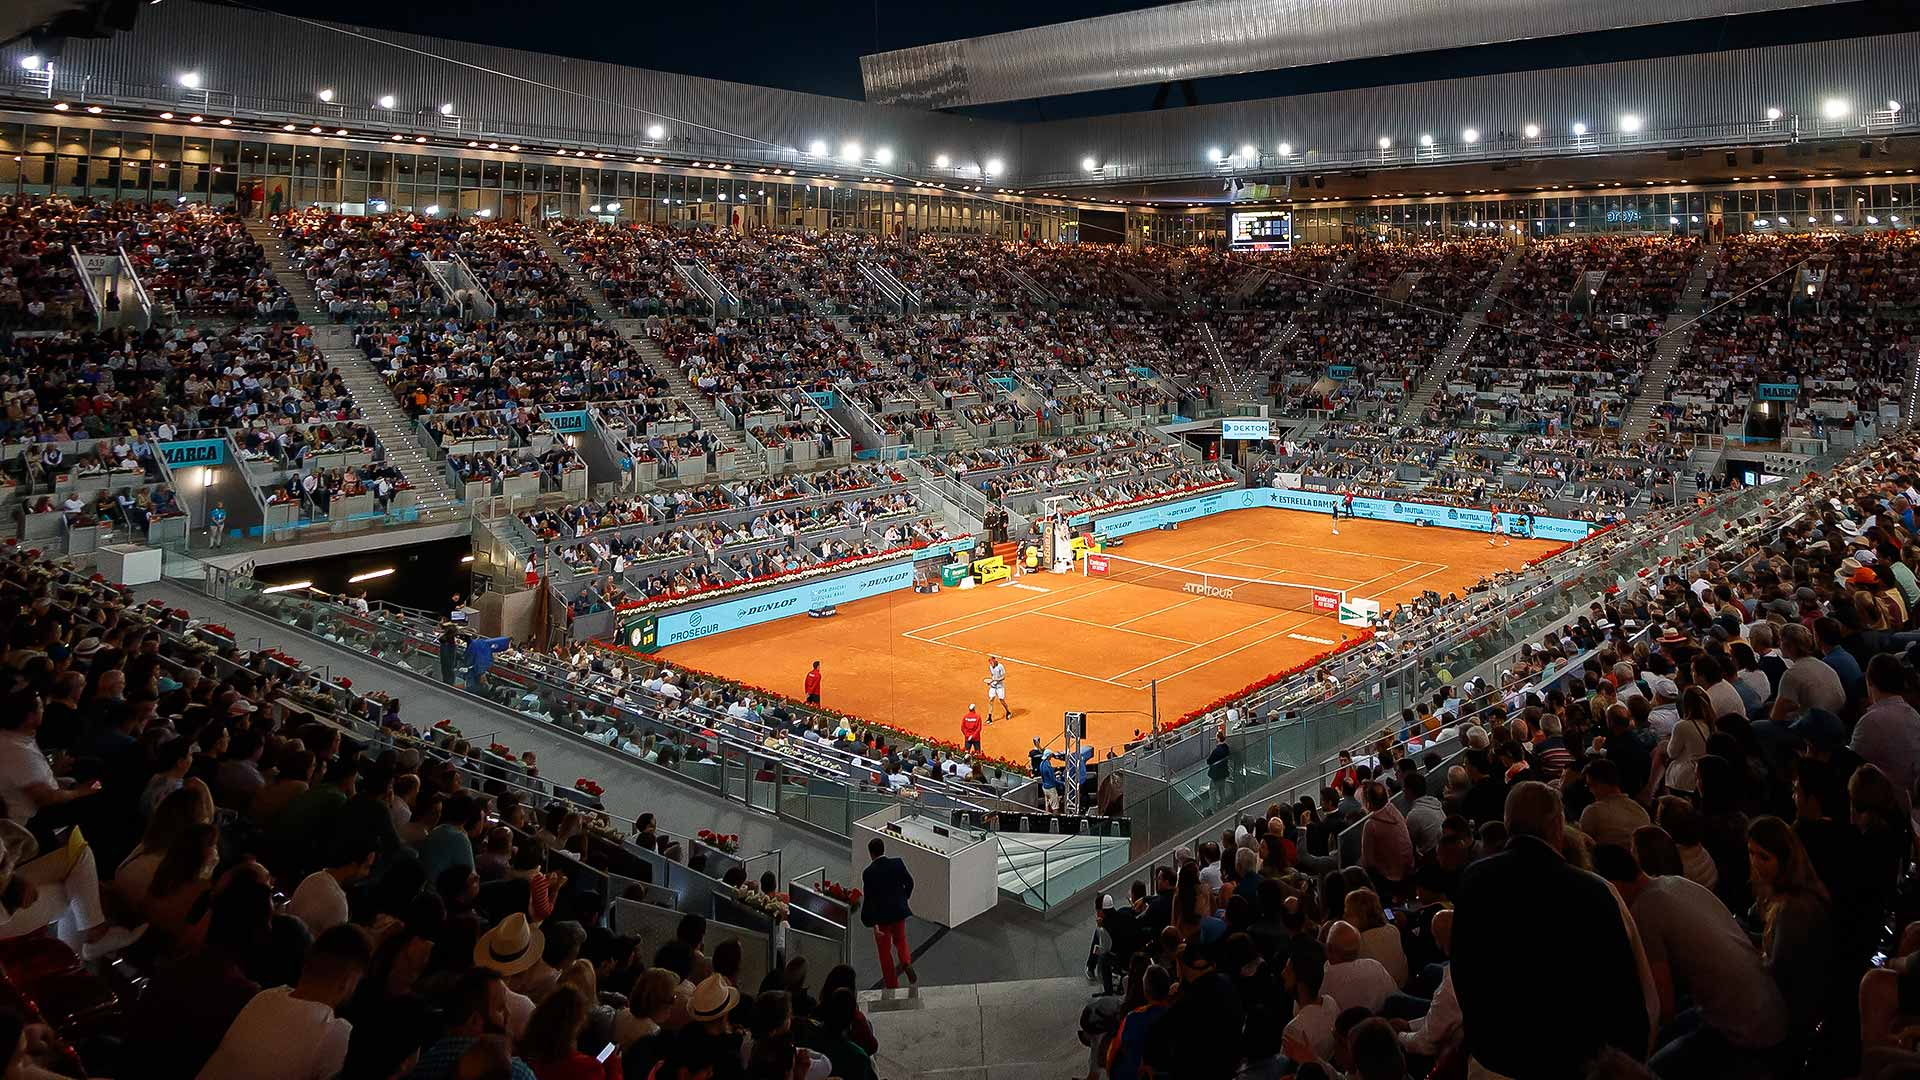 madrid tournimage 2019 night - 2-kratna Grand Slam zmagovalka odpovedala turnir v Madridu